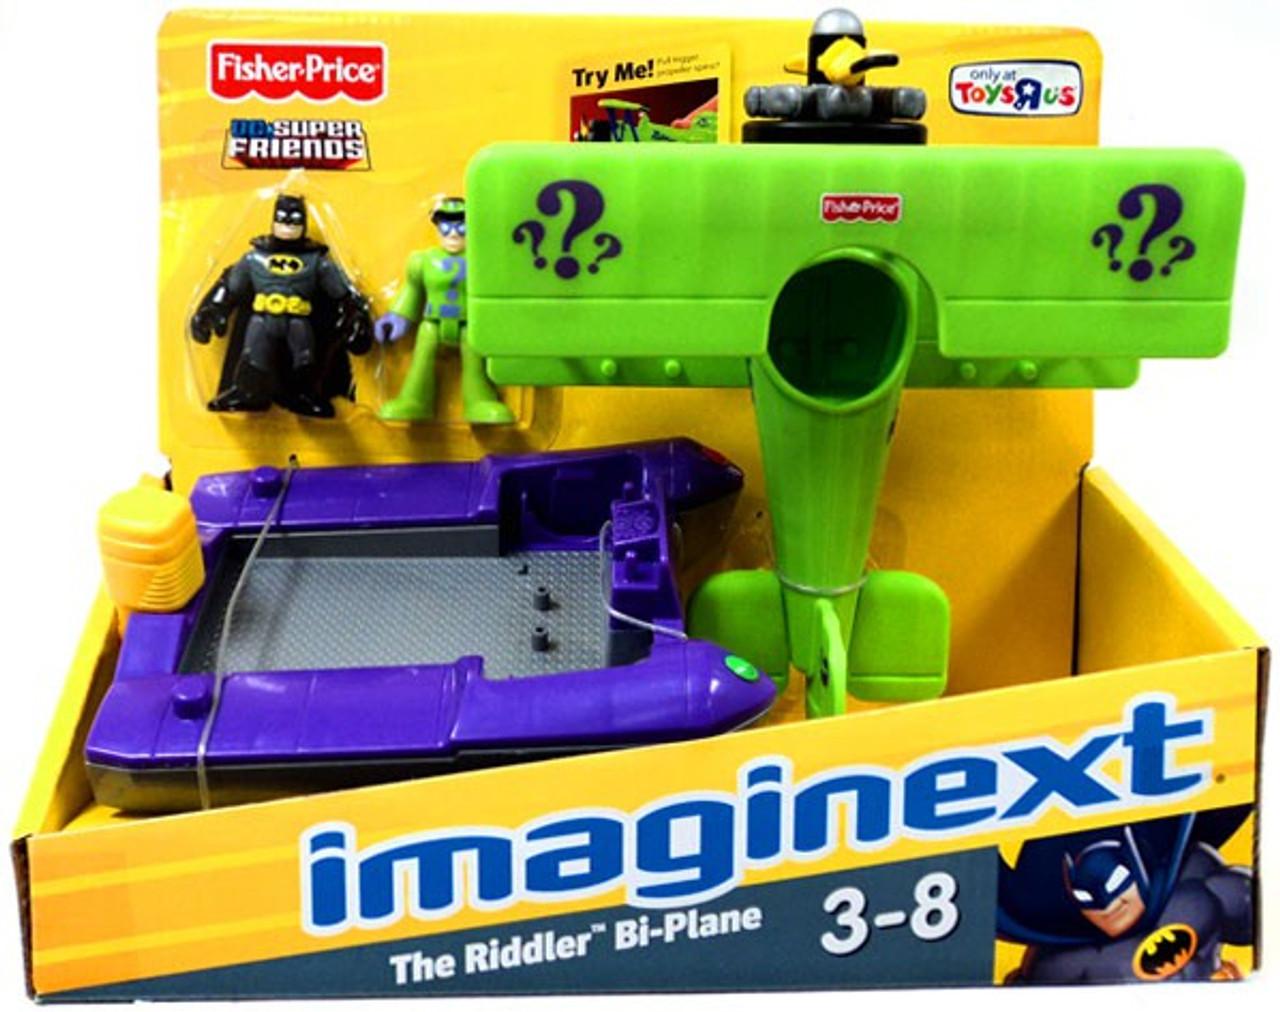 Fisher Price DC Super Friends Batman Imaginext The Riddler ... |Imaginext Riddler